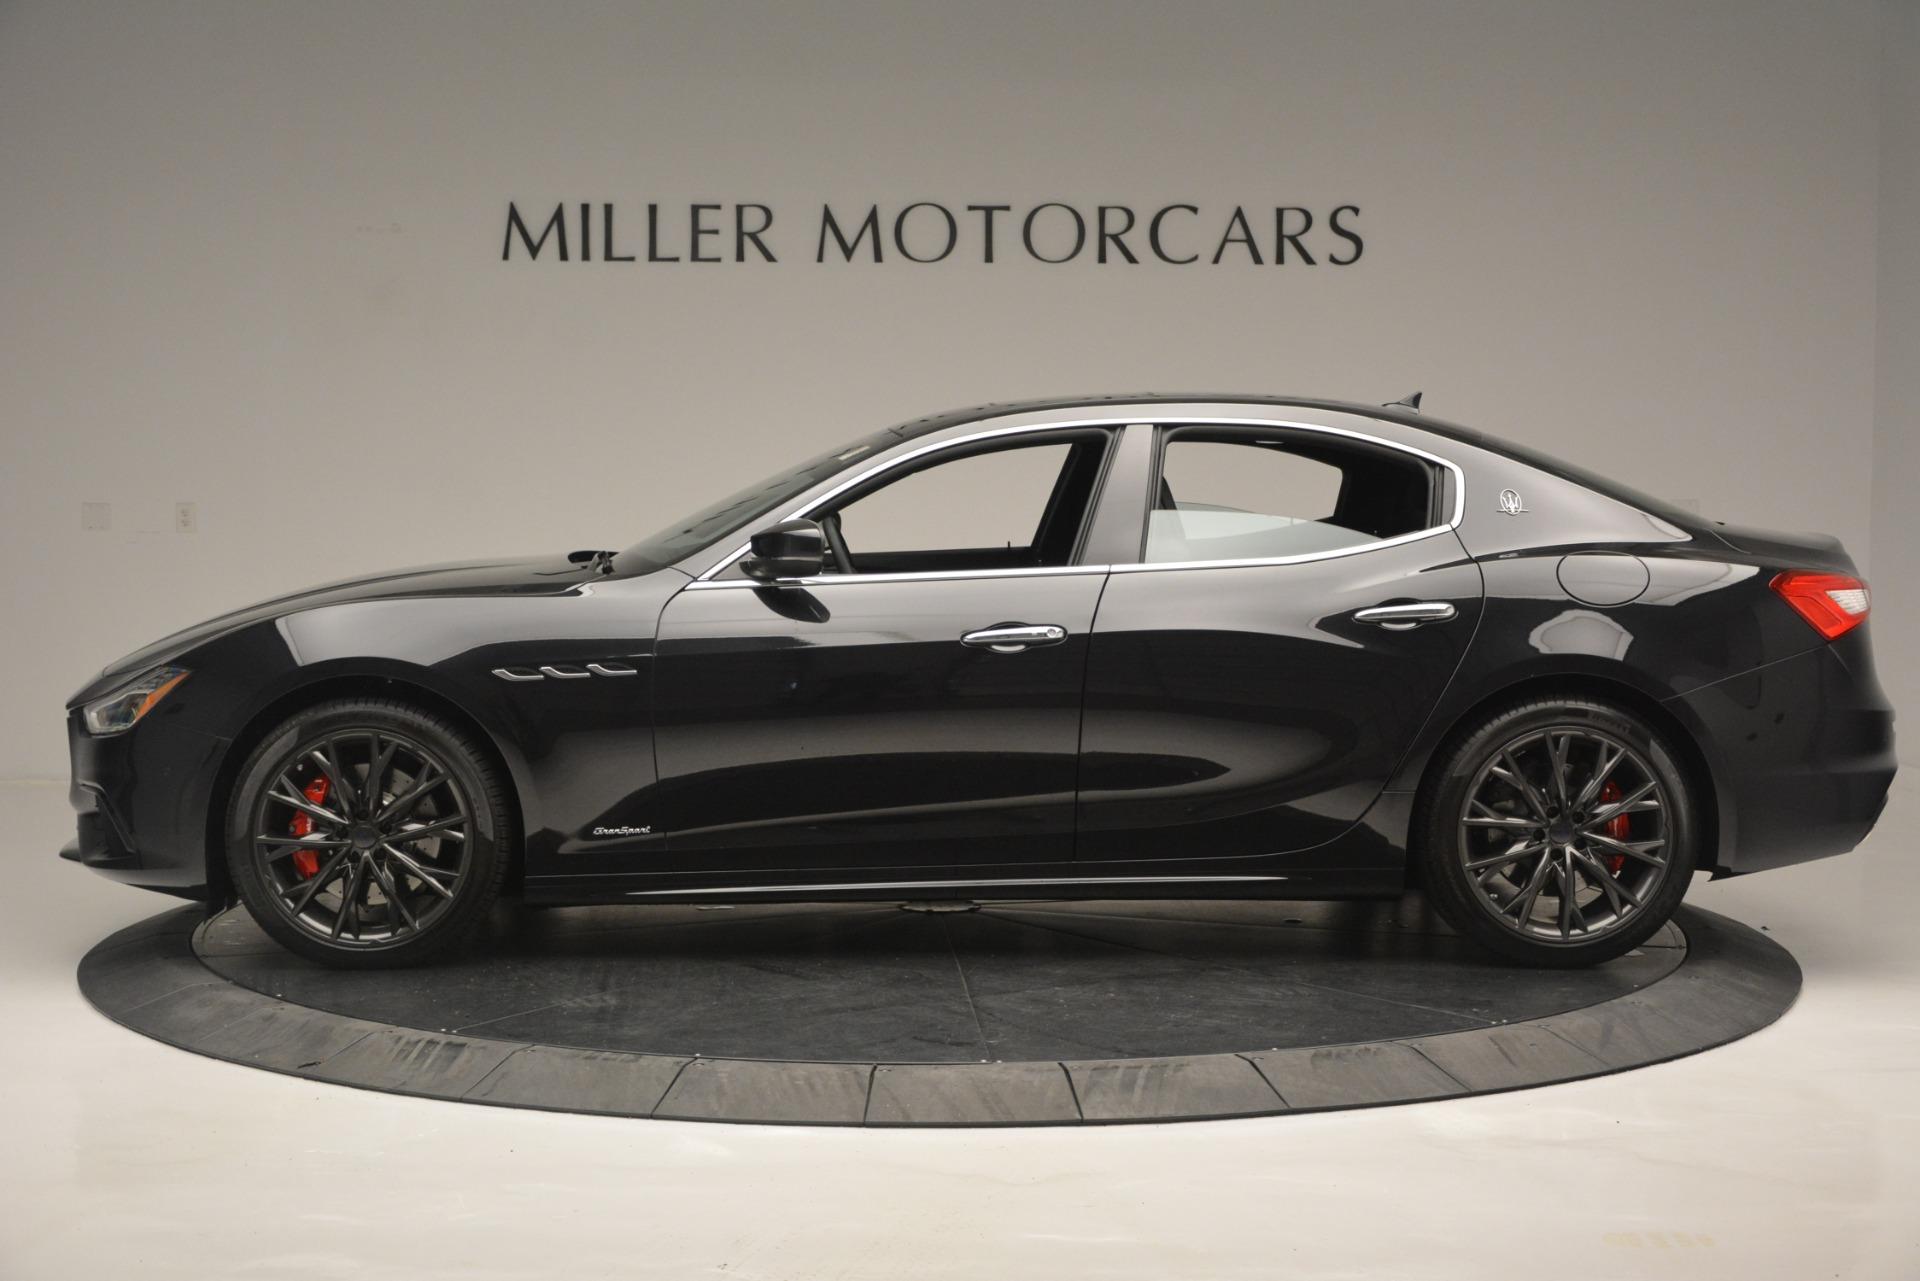 New 2019 Maserati Ghibli S Q4 GranSport For Sale In Greenwich, CT 2588_p3